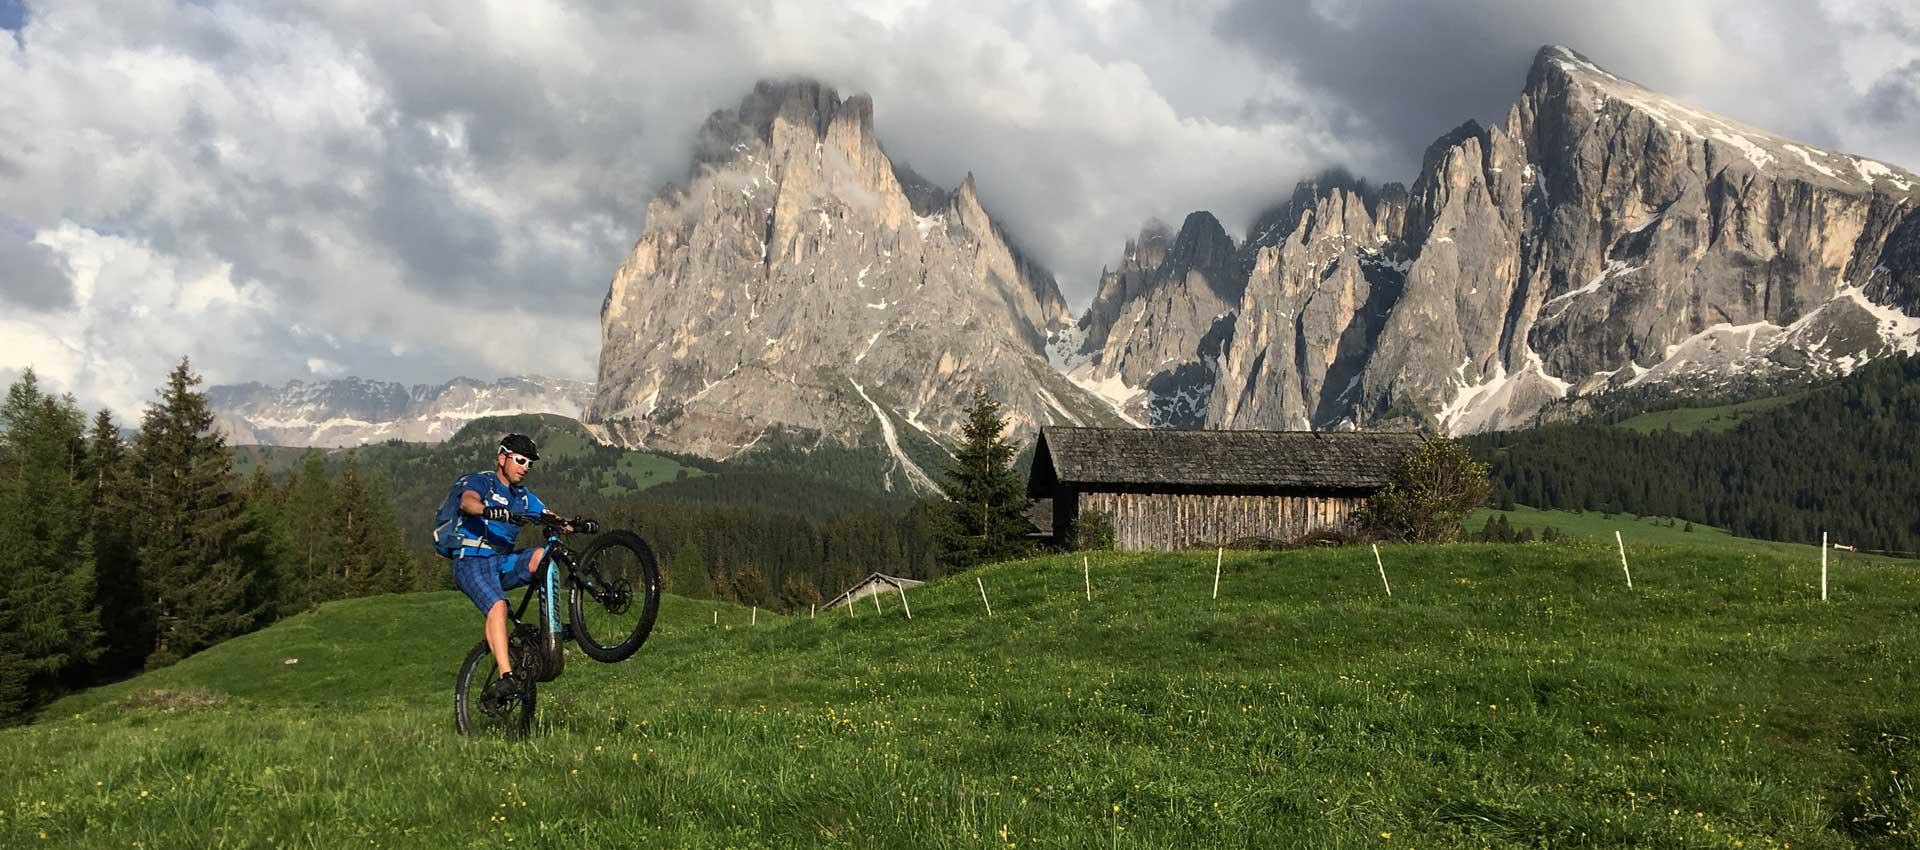 Sassolungo, Hartl, Alpe di Siusi